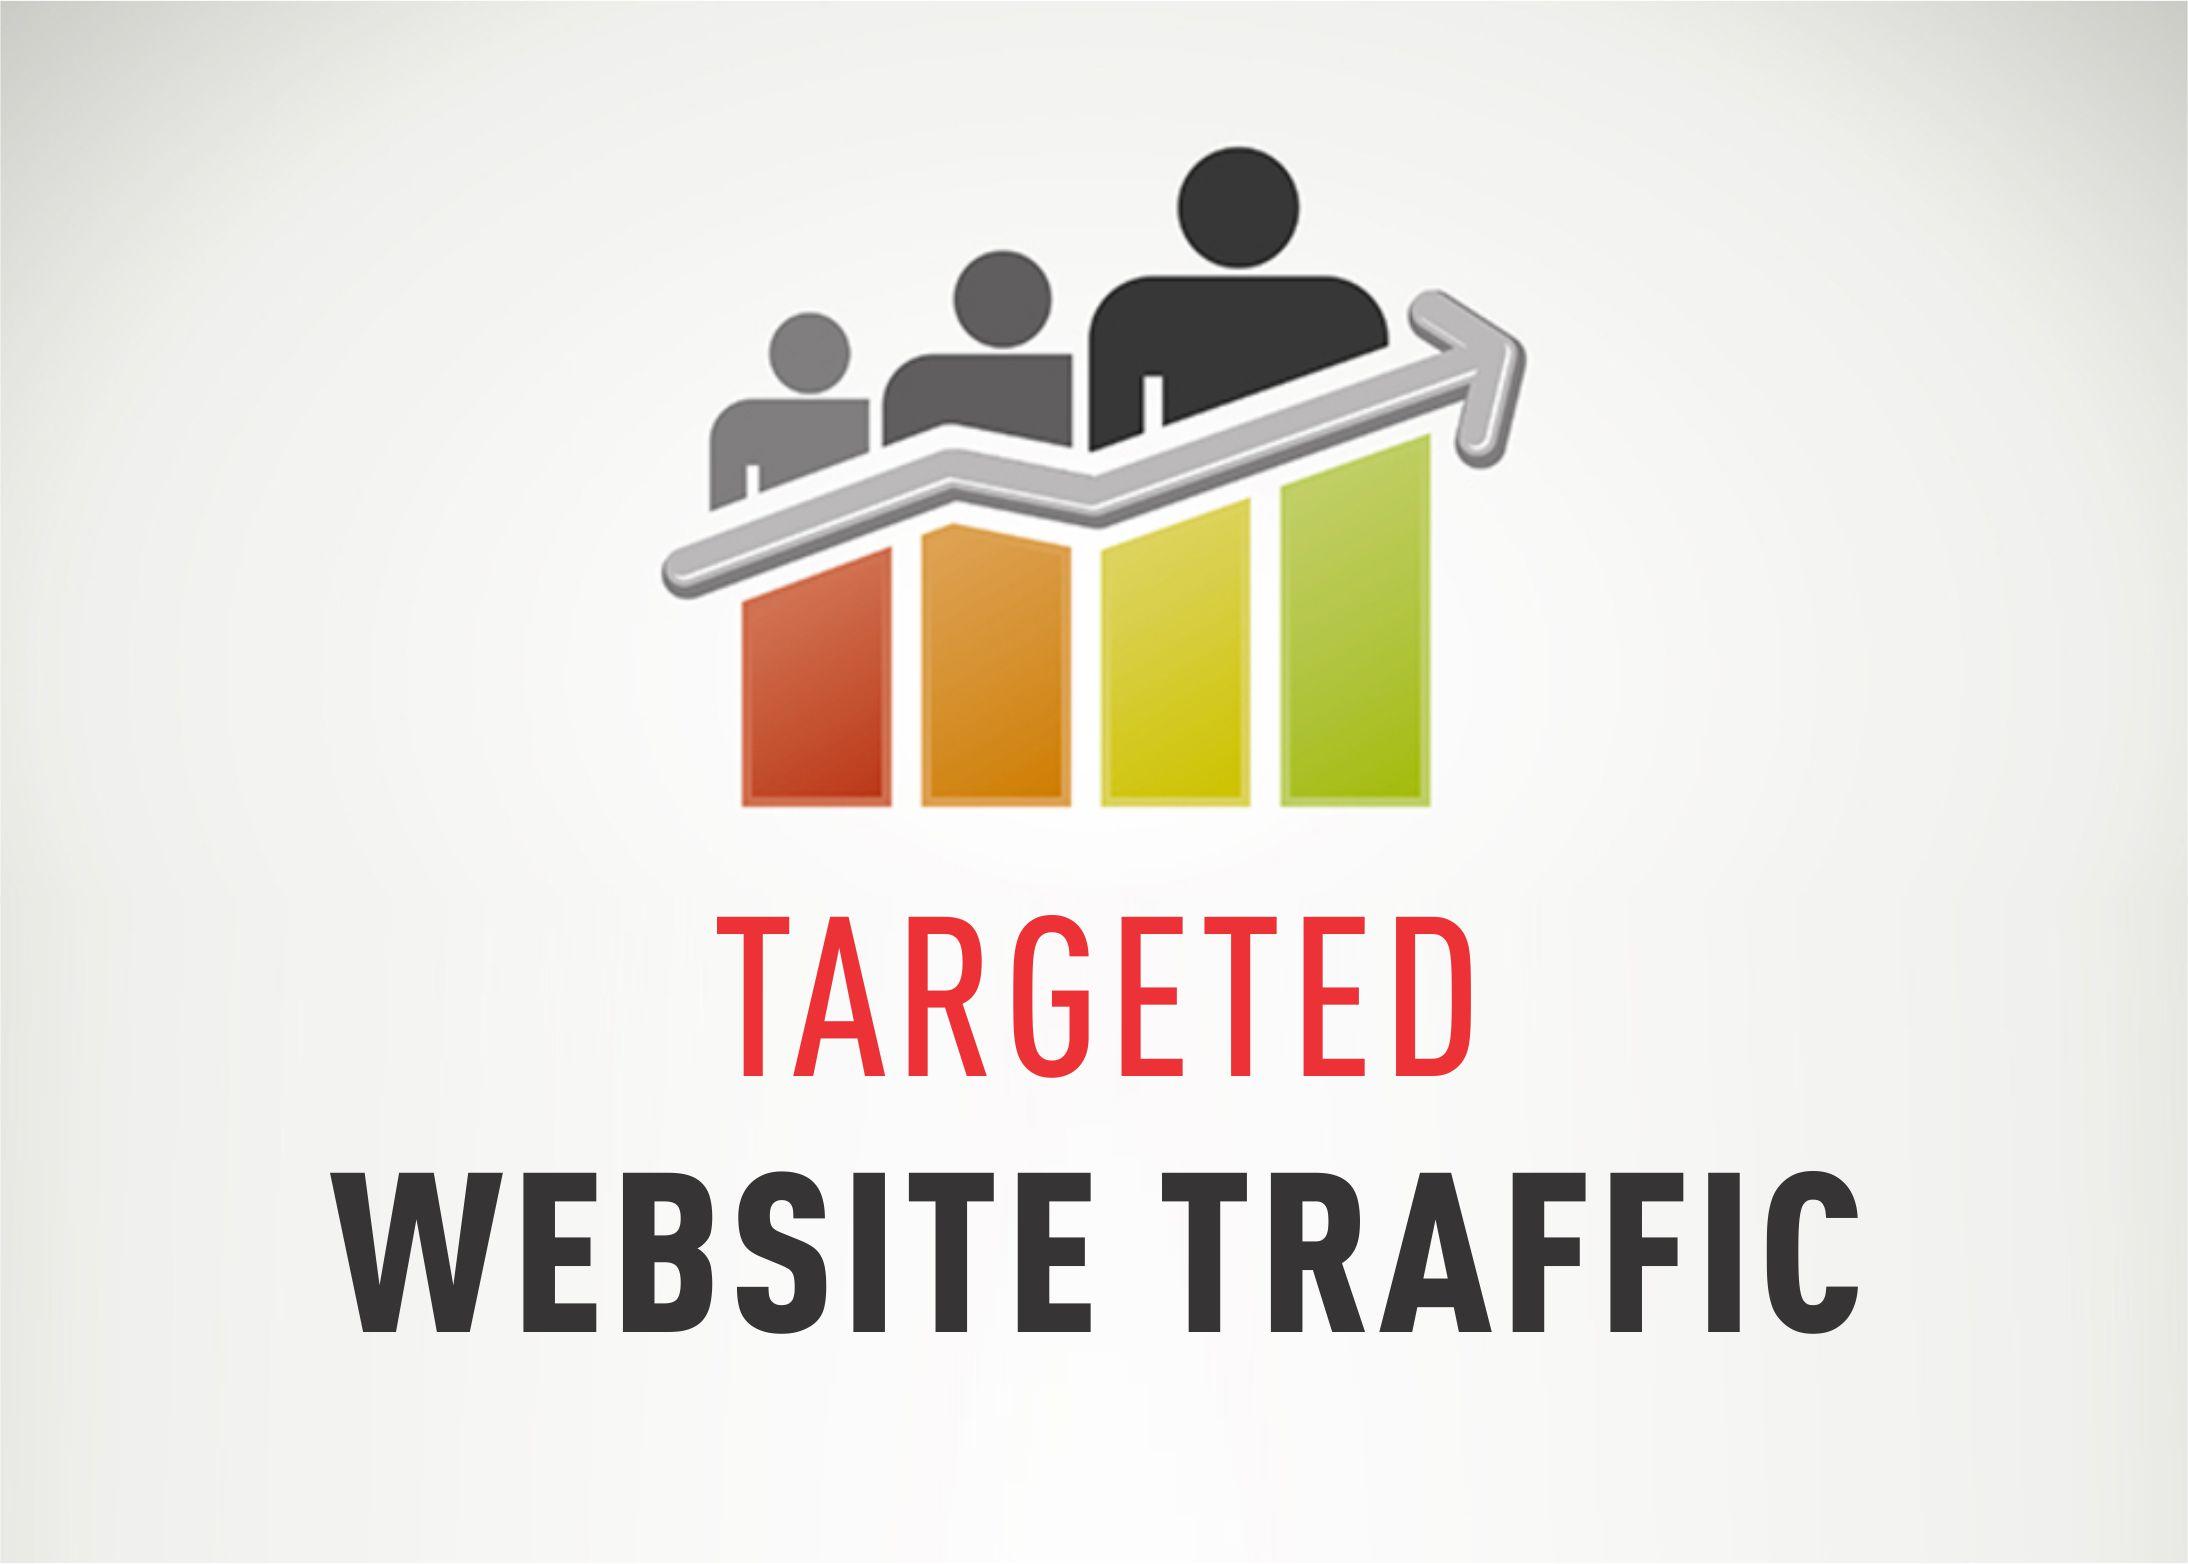 1500 Genuine and Organic Targeted Traffic